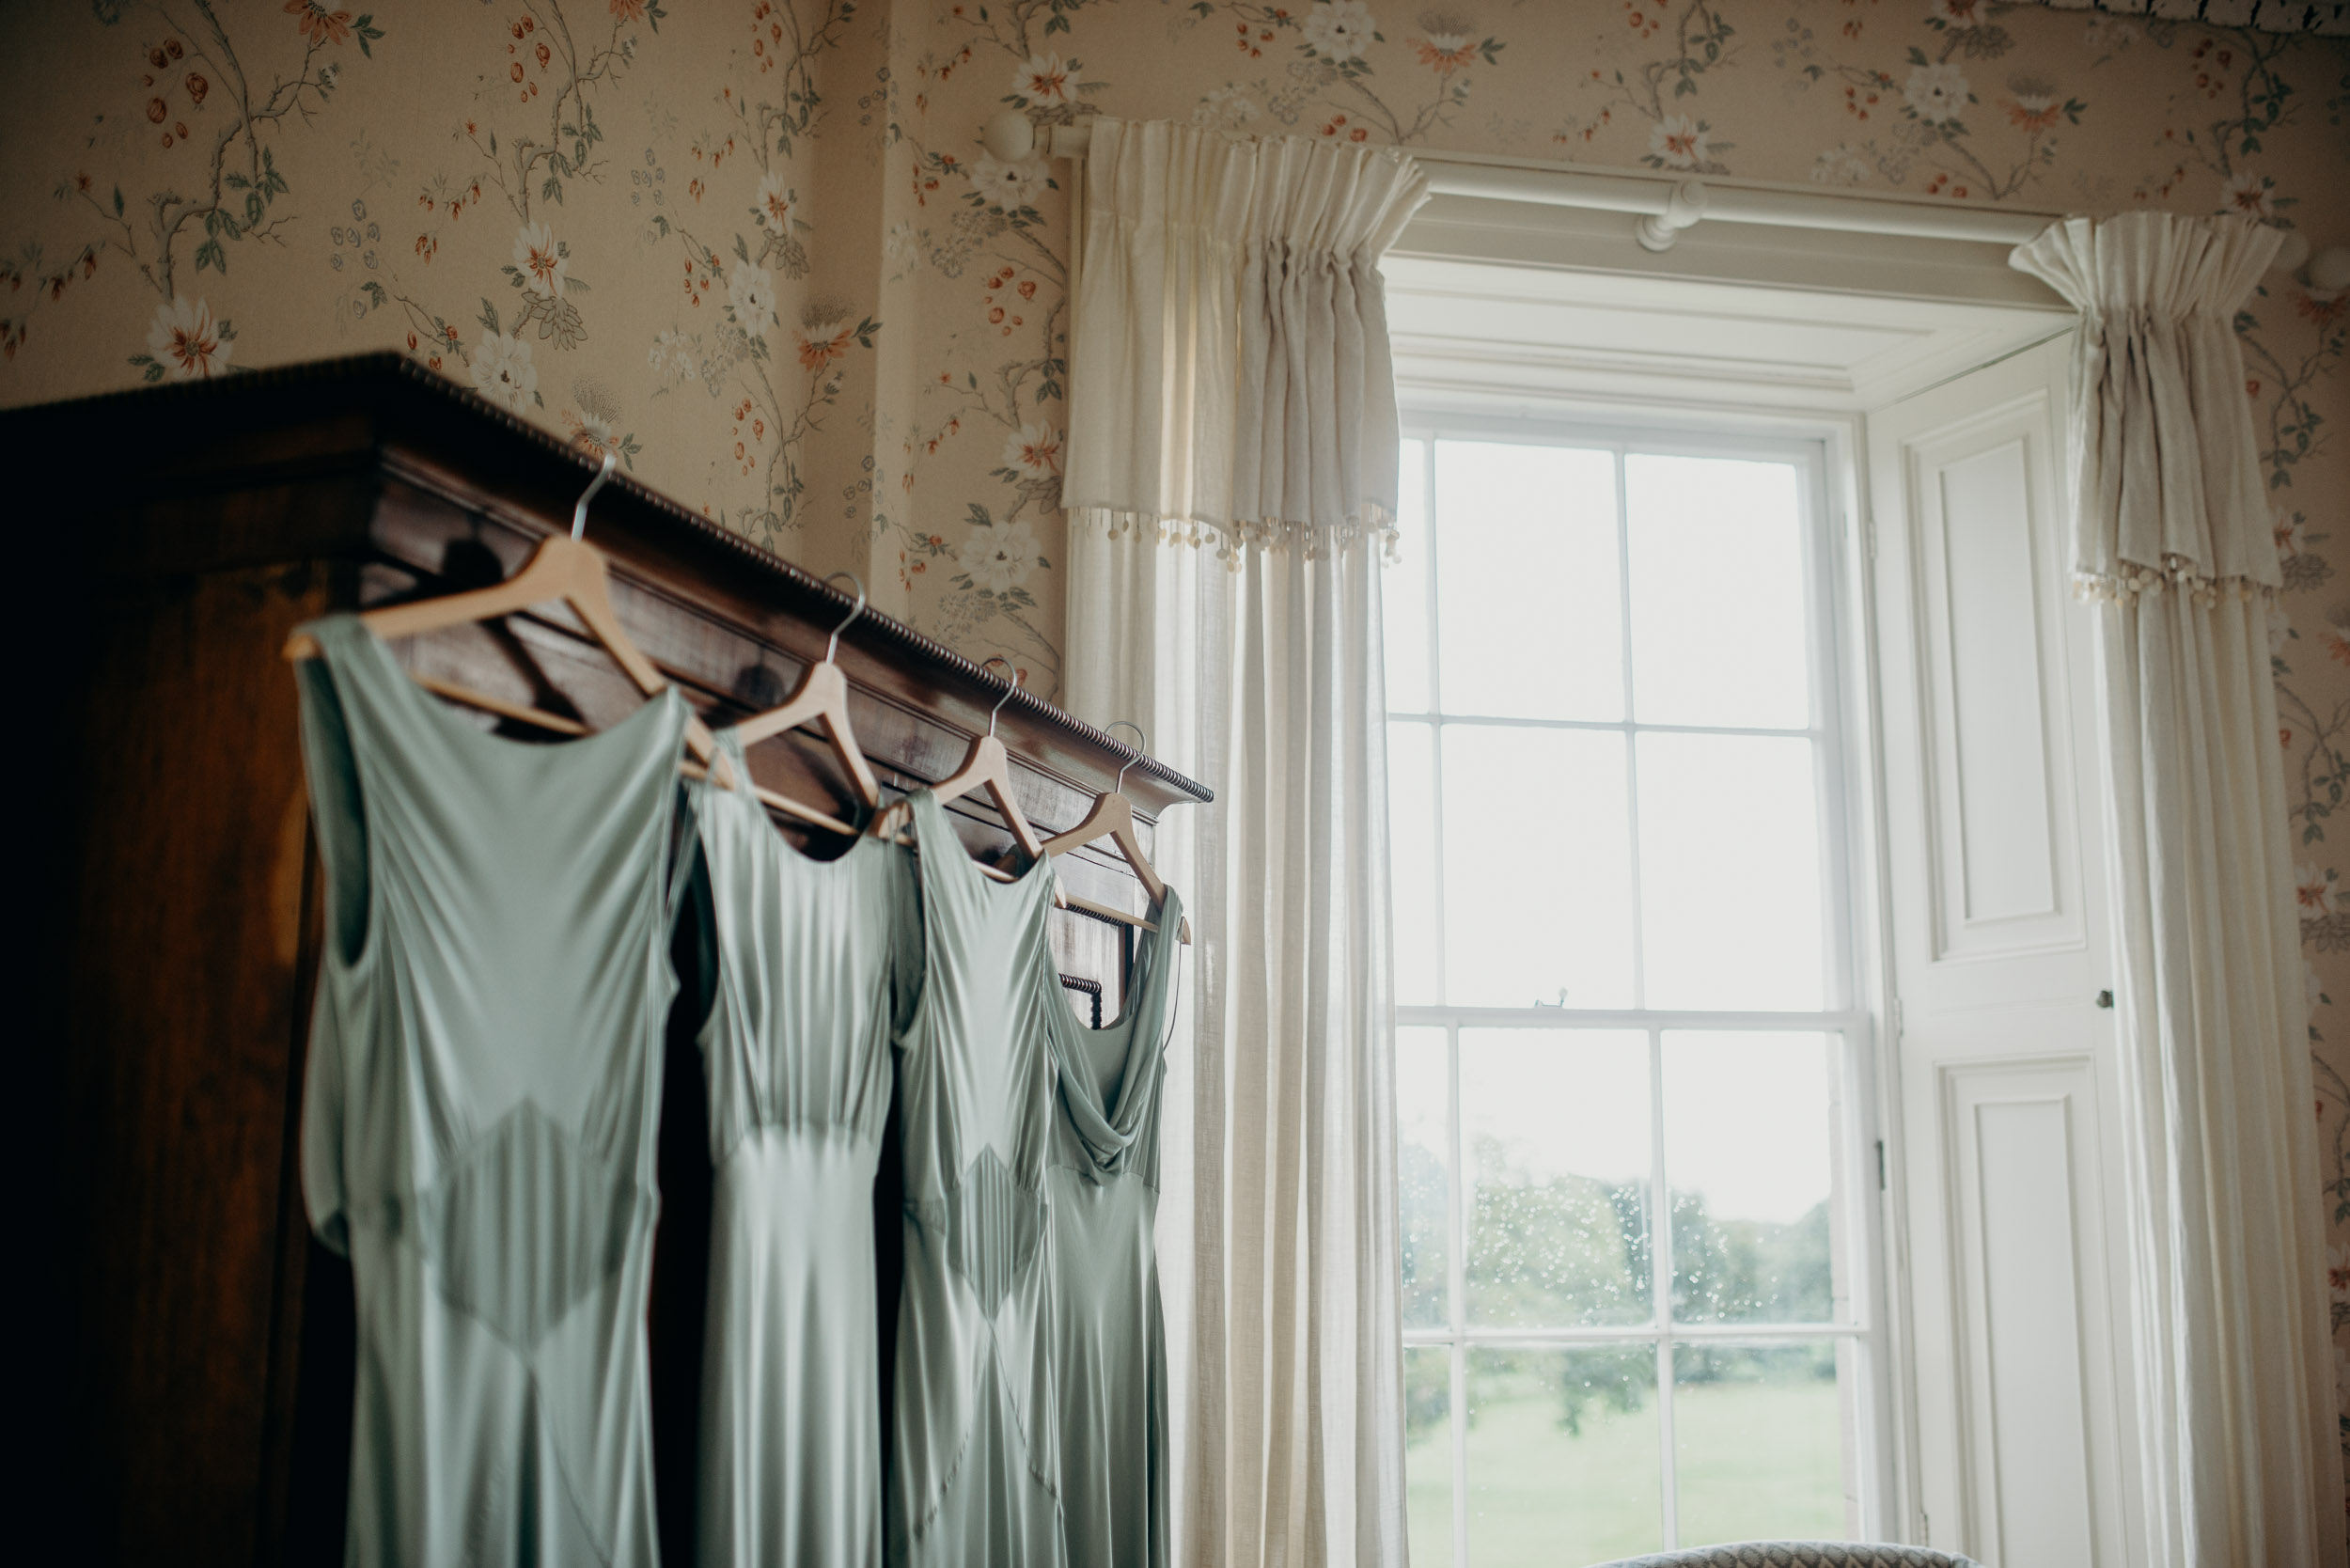 drenagh estate wedding photography-12.jpg